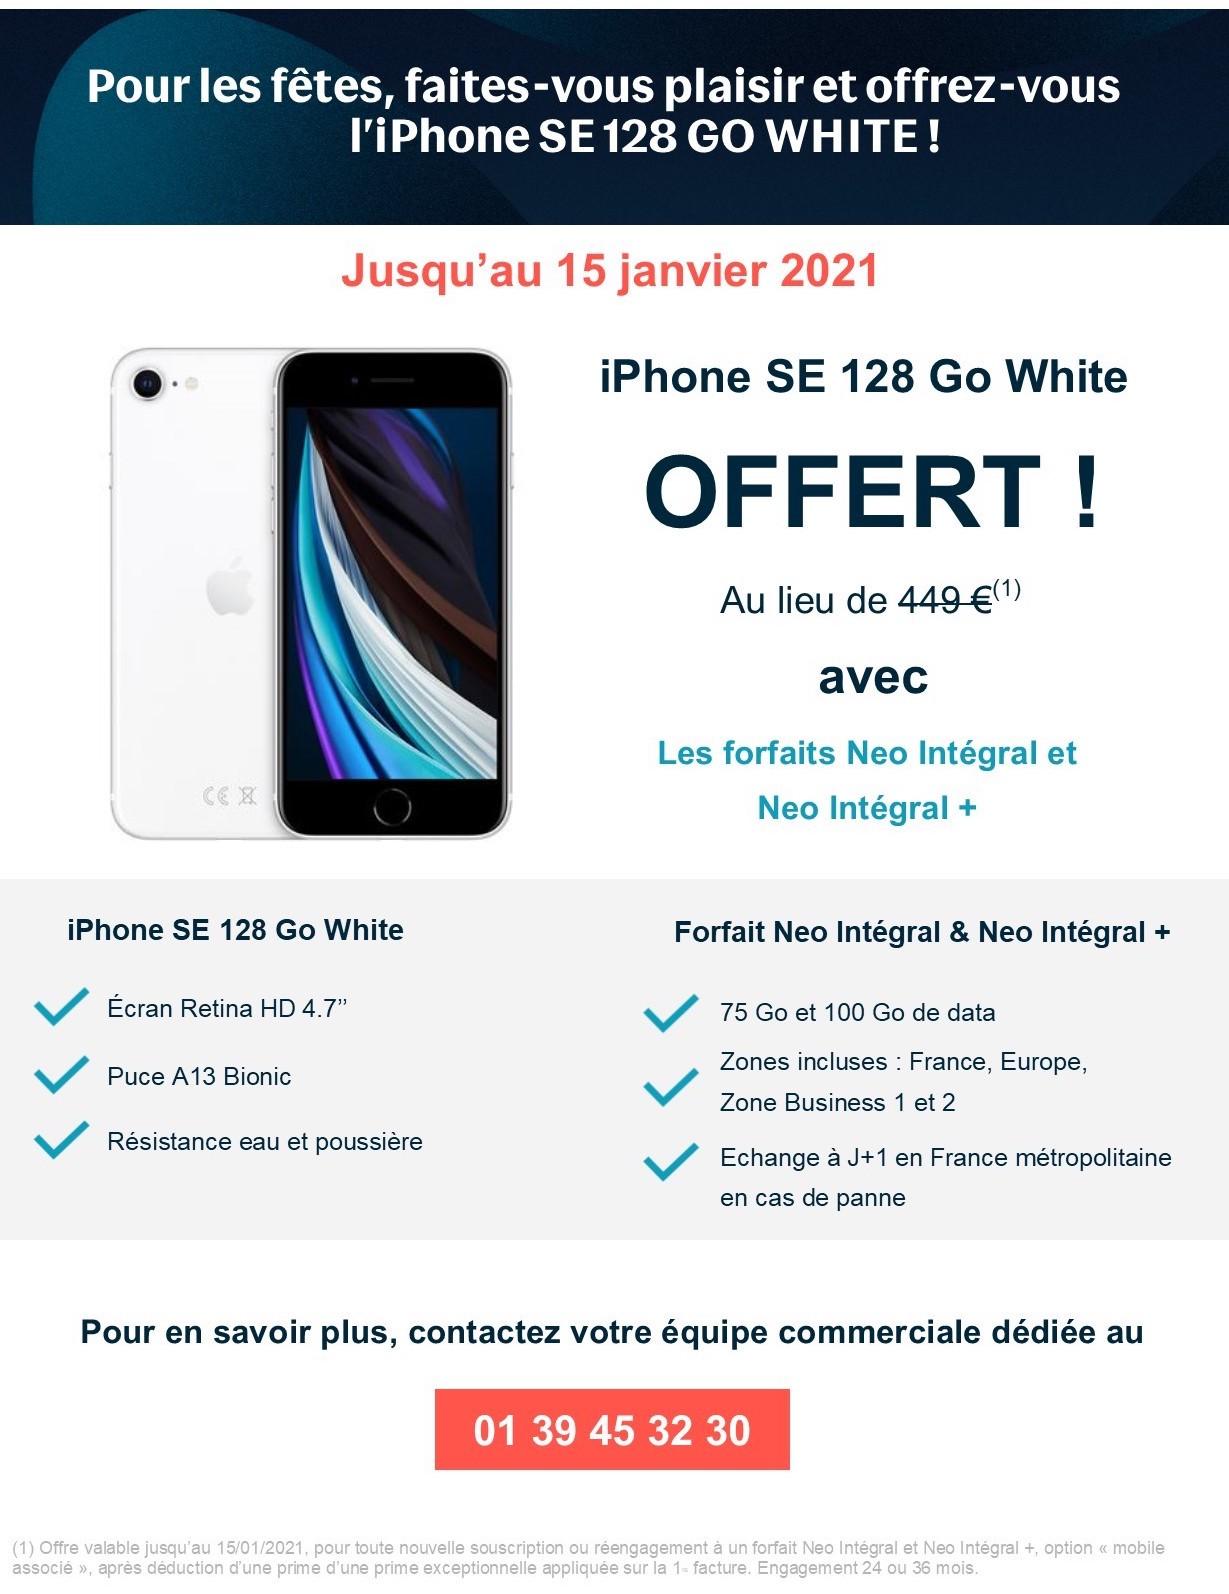 iPhone SE 128 Go White OFFERT avec les forfaits Neo Intégral et Neo Intégral +